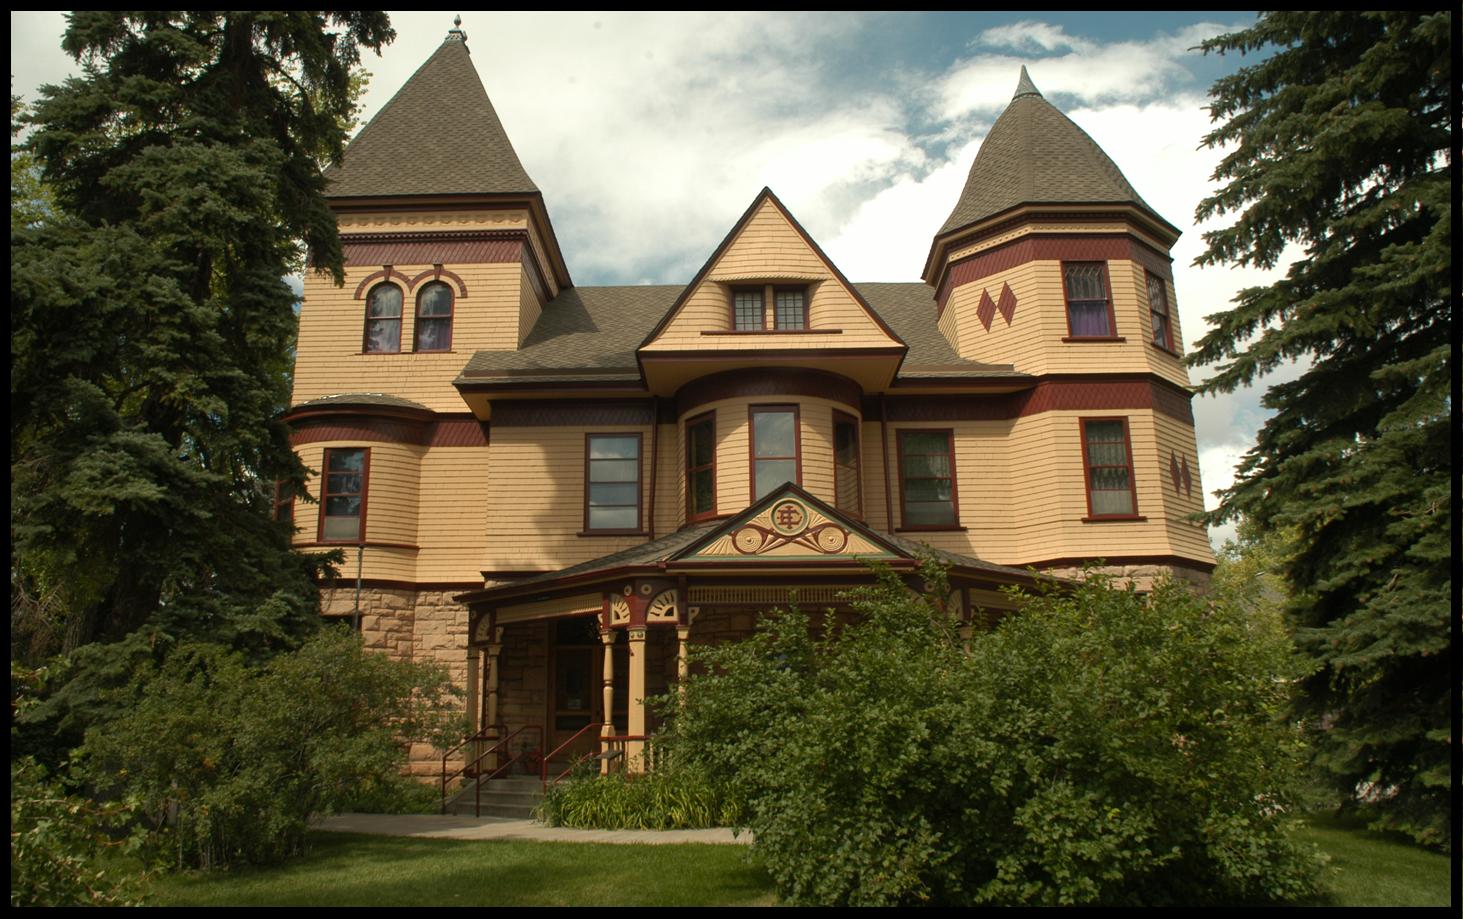 The Ivinson Mansion, now the Laramie Plains Museum